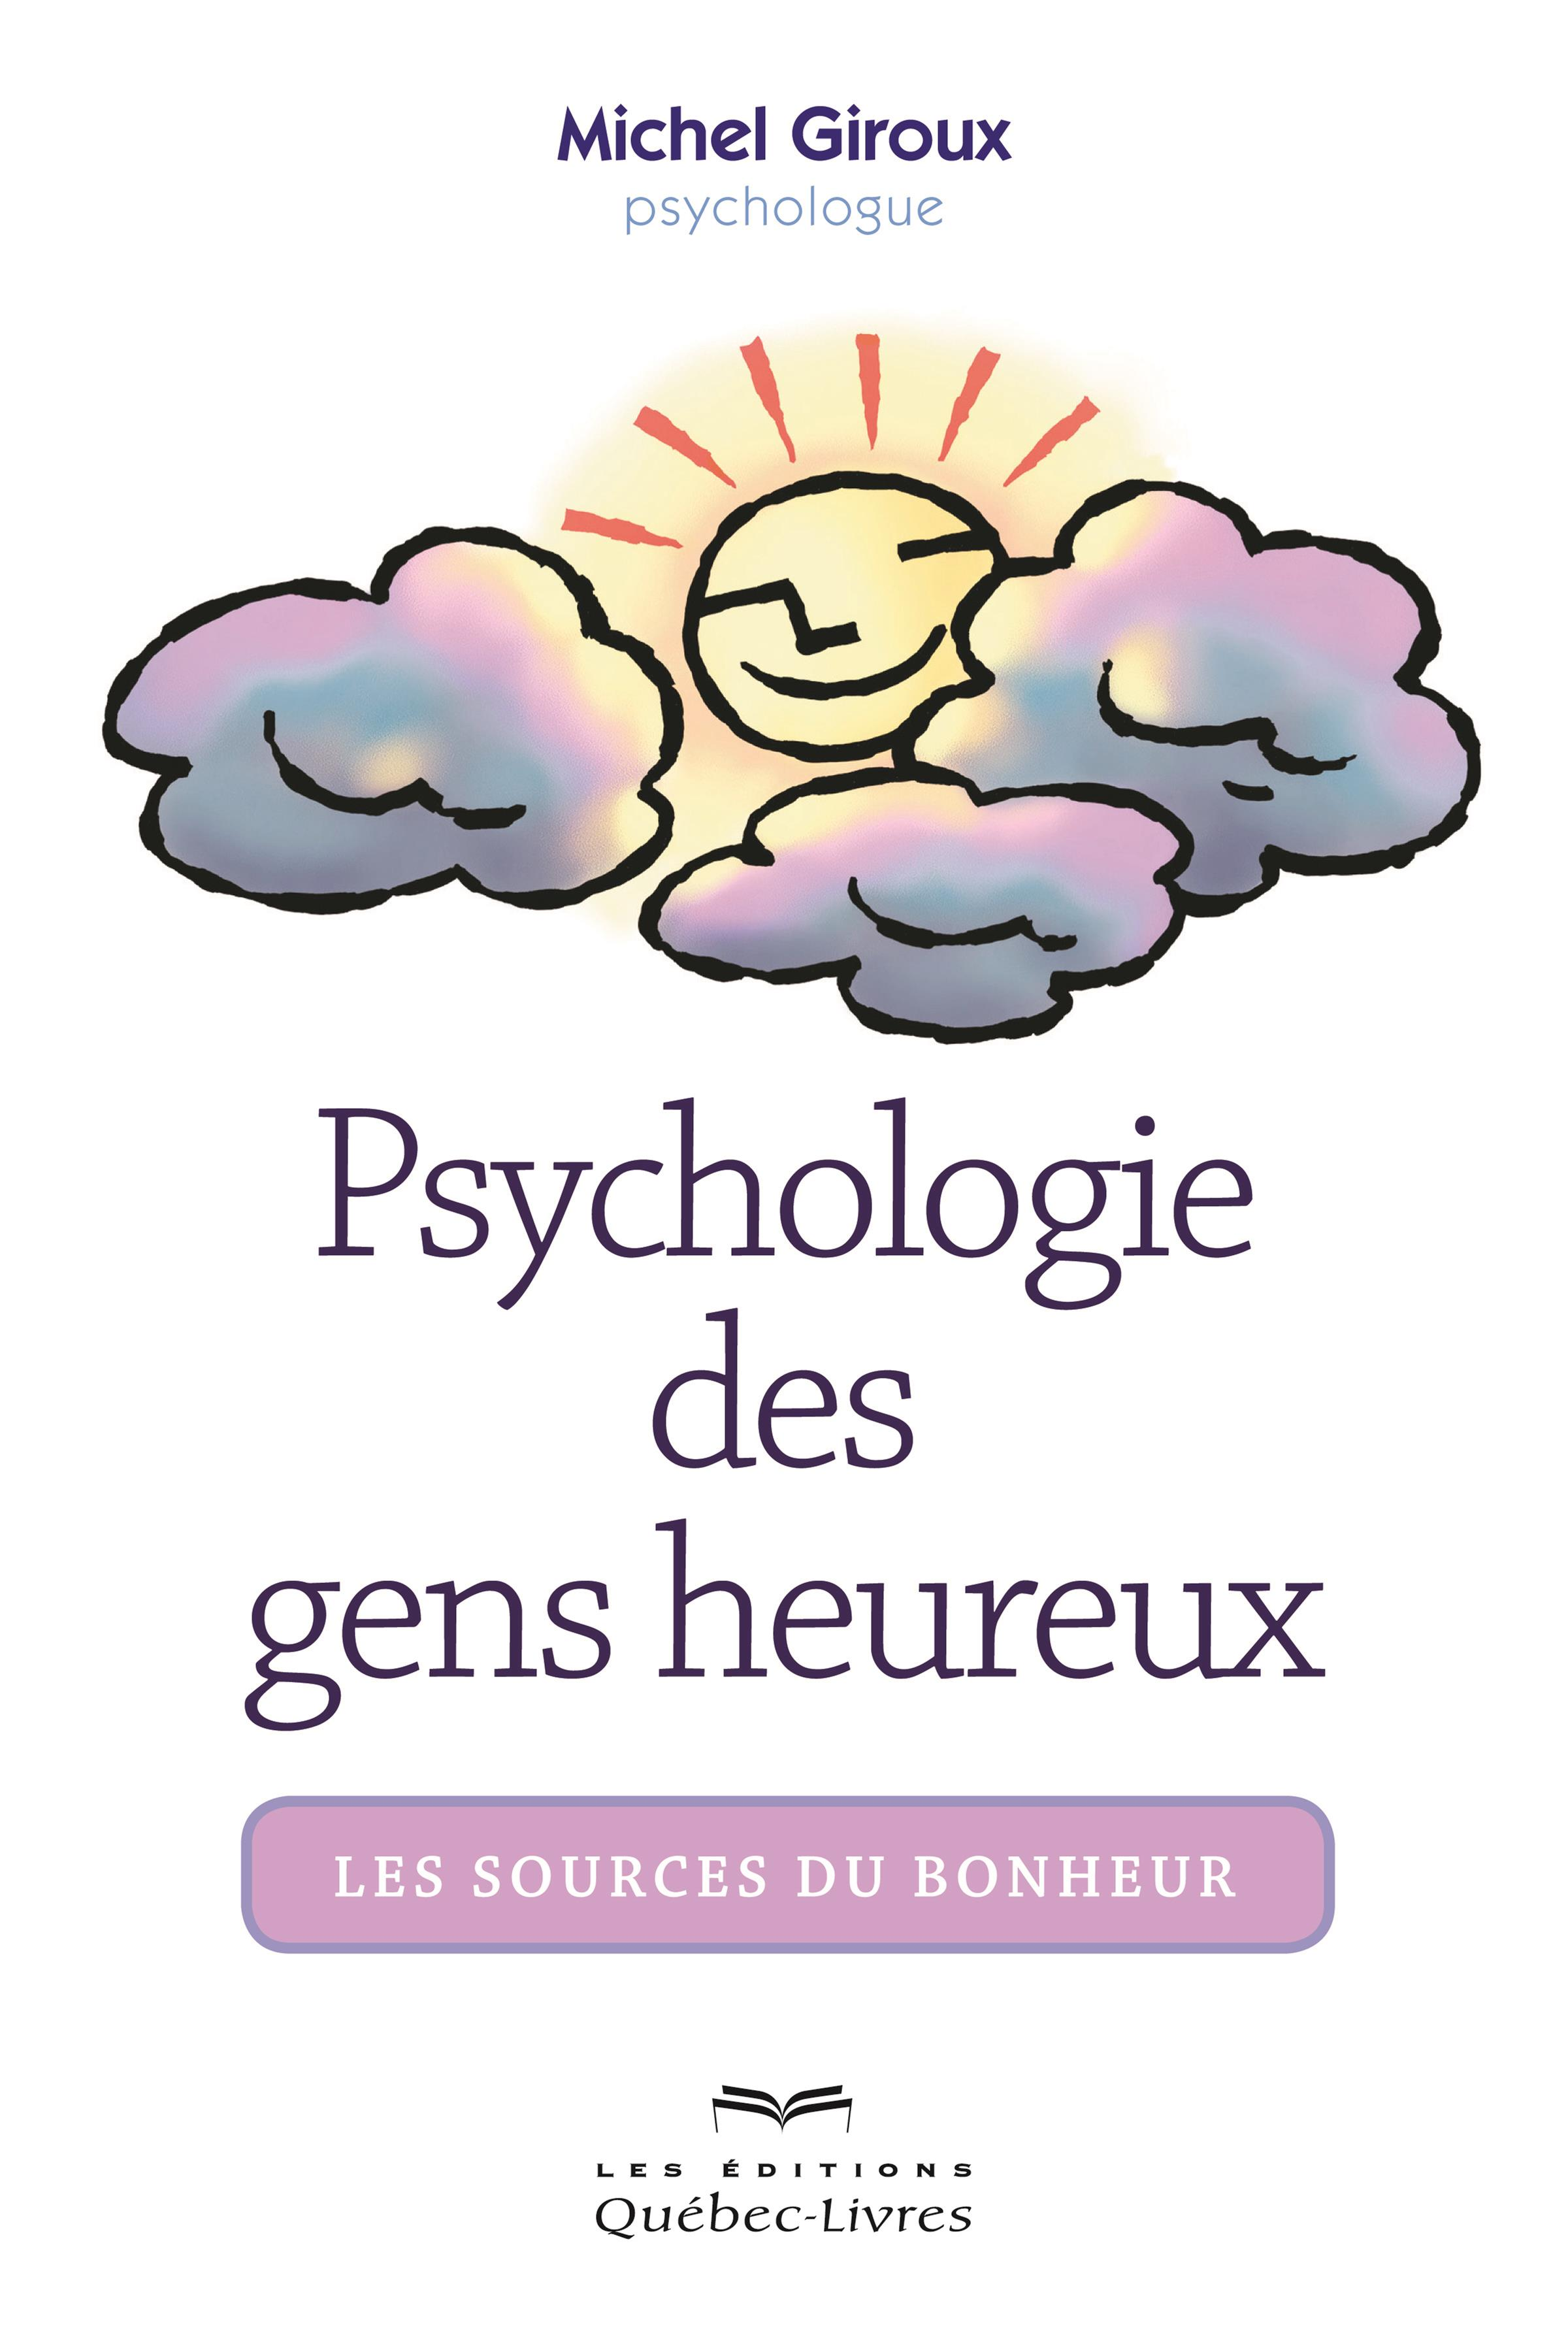 Psychologie des gens heureux